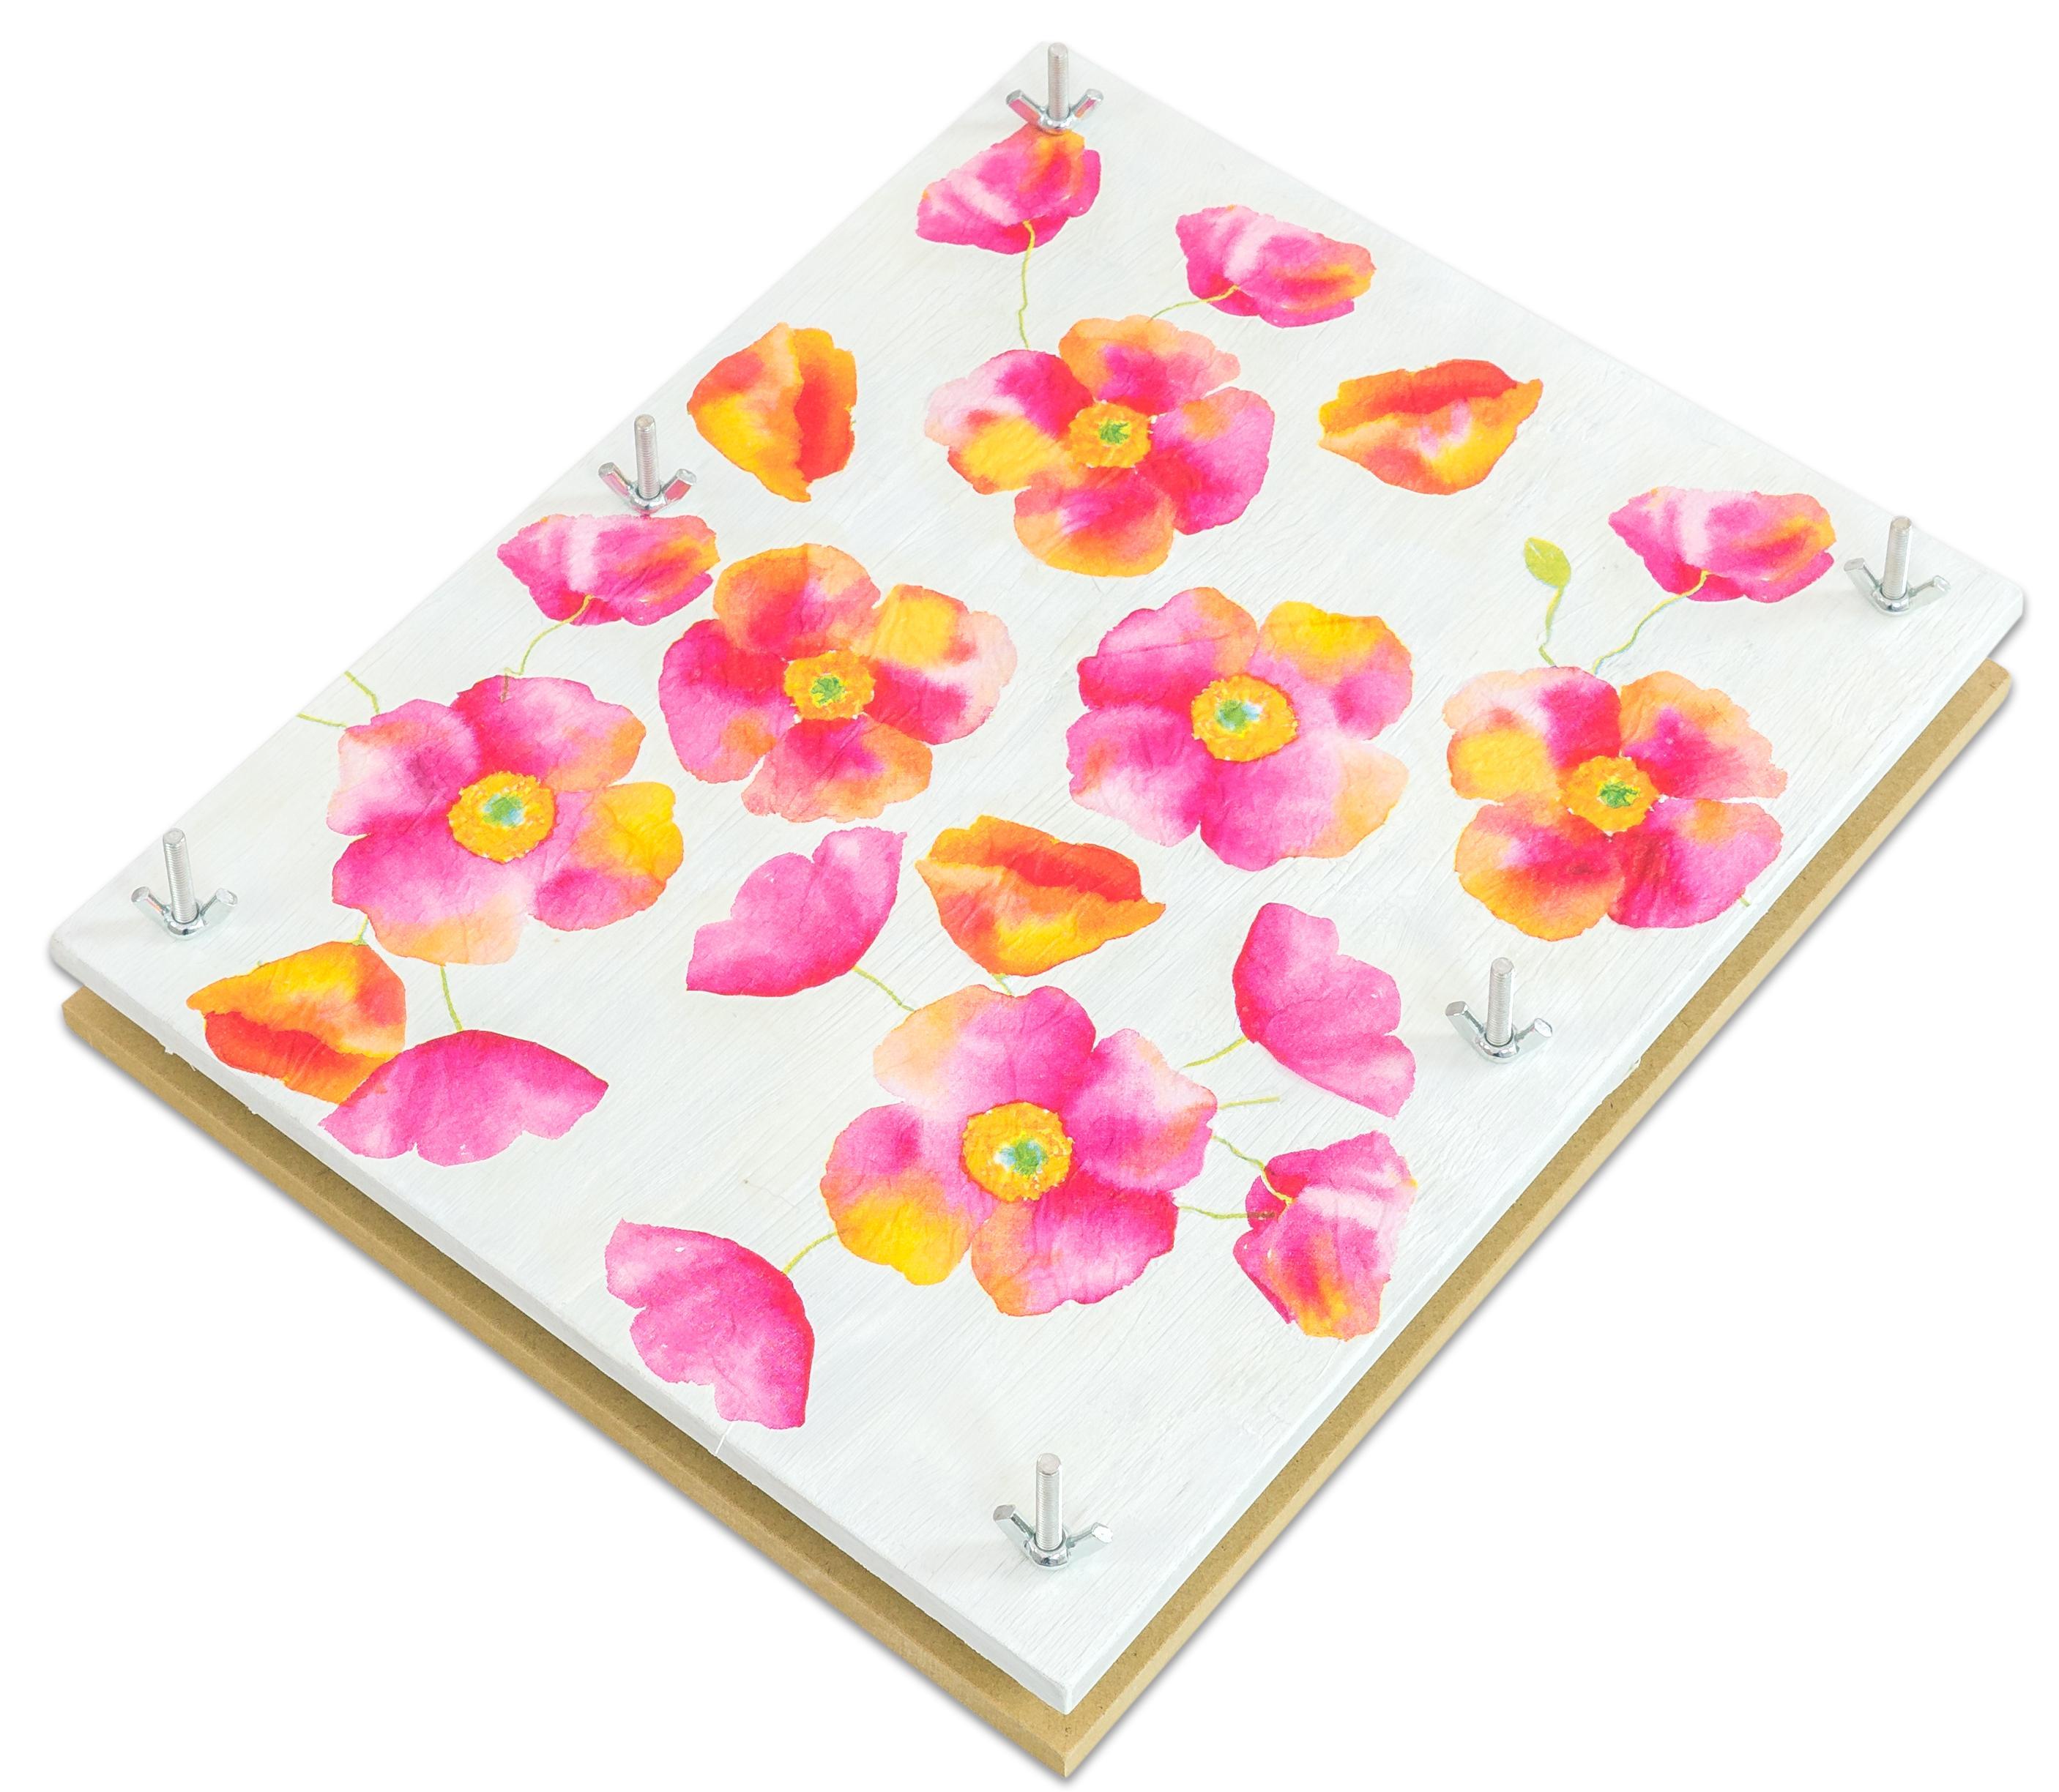 Grosse-Blumenpresse-aus-Holz-Pflanzenpresse-XXL-Bluetenpresse-fuer-Kinder-32x26-cm